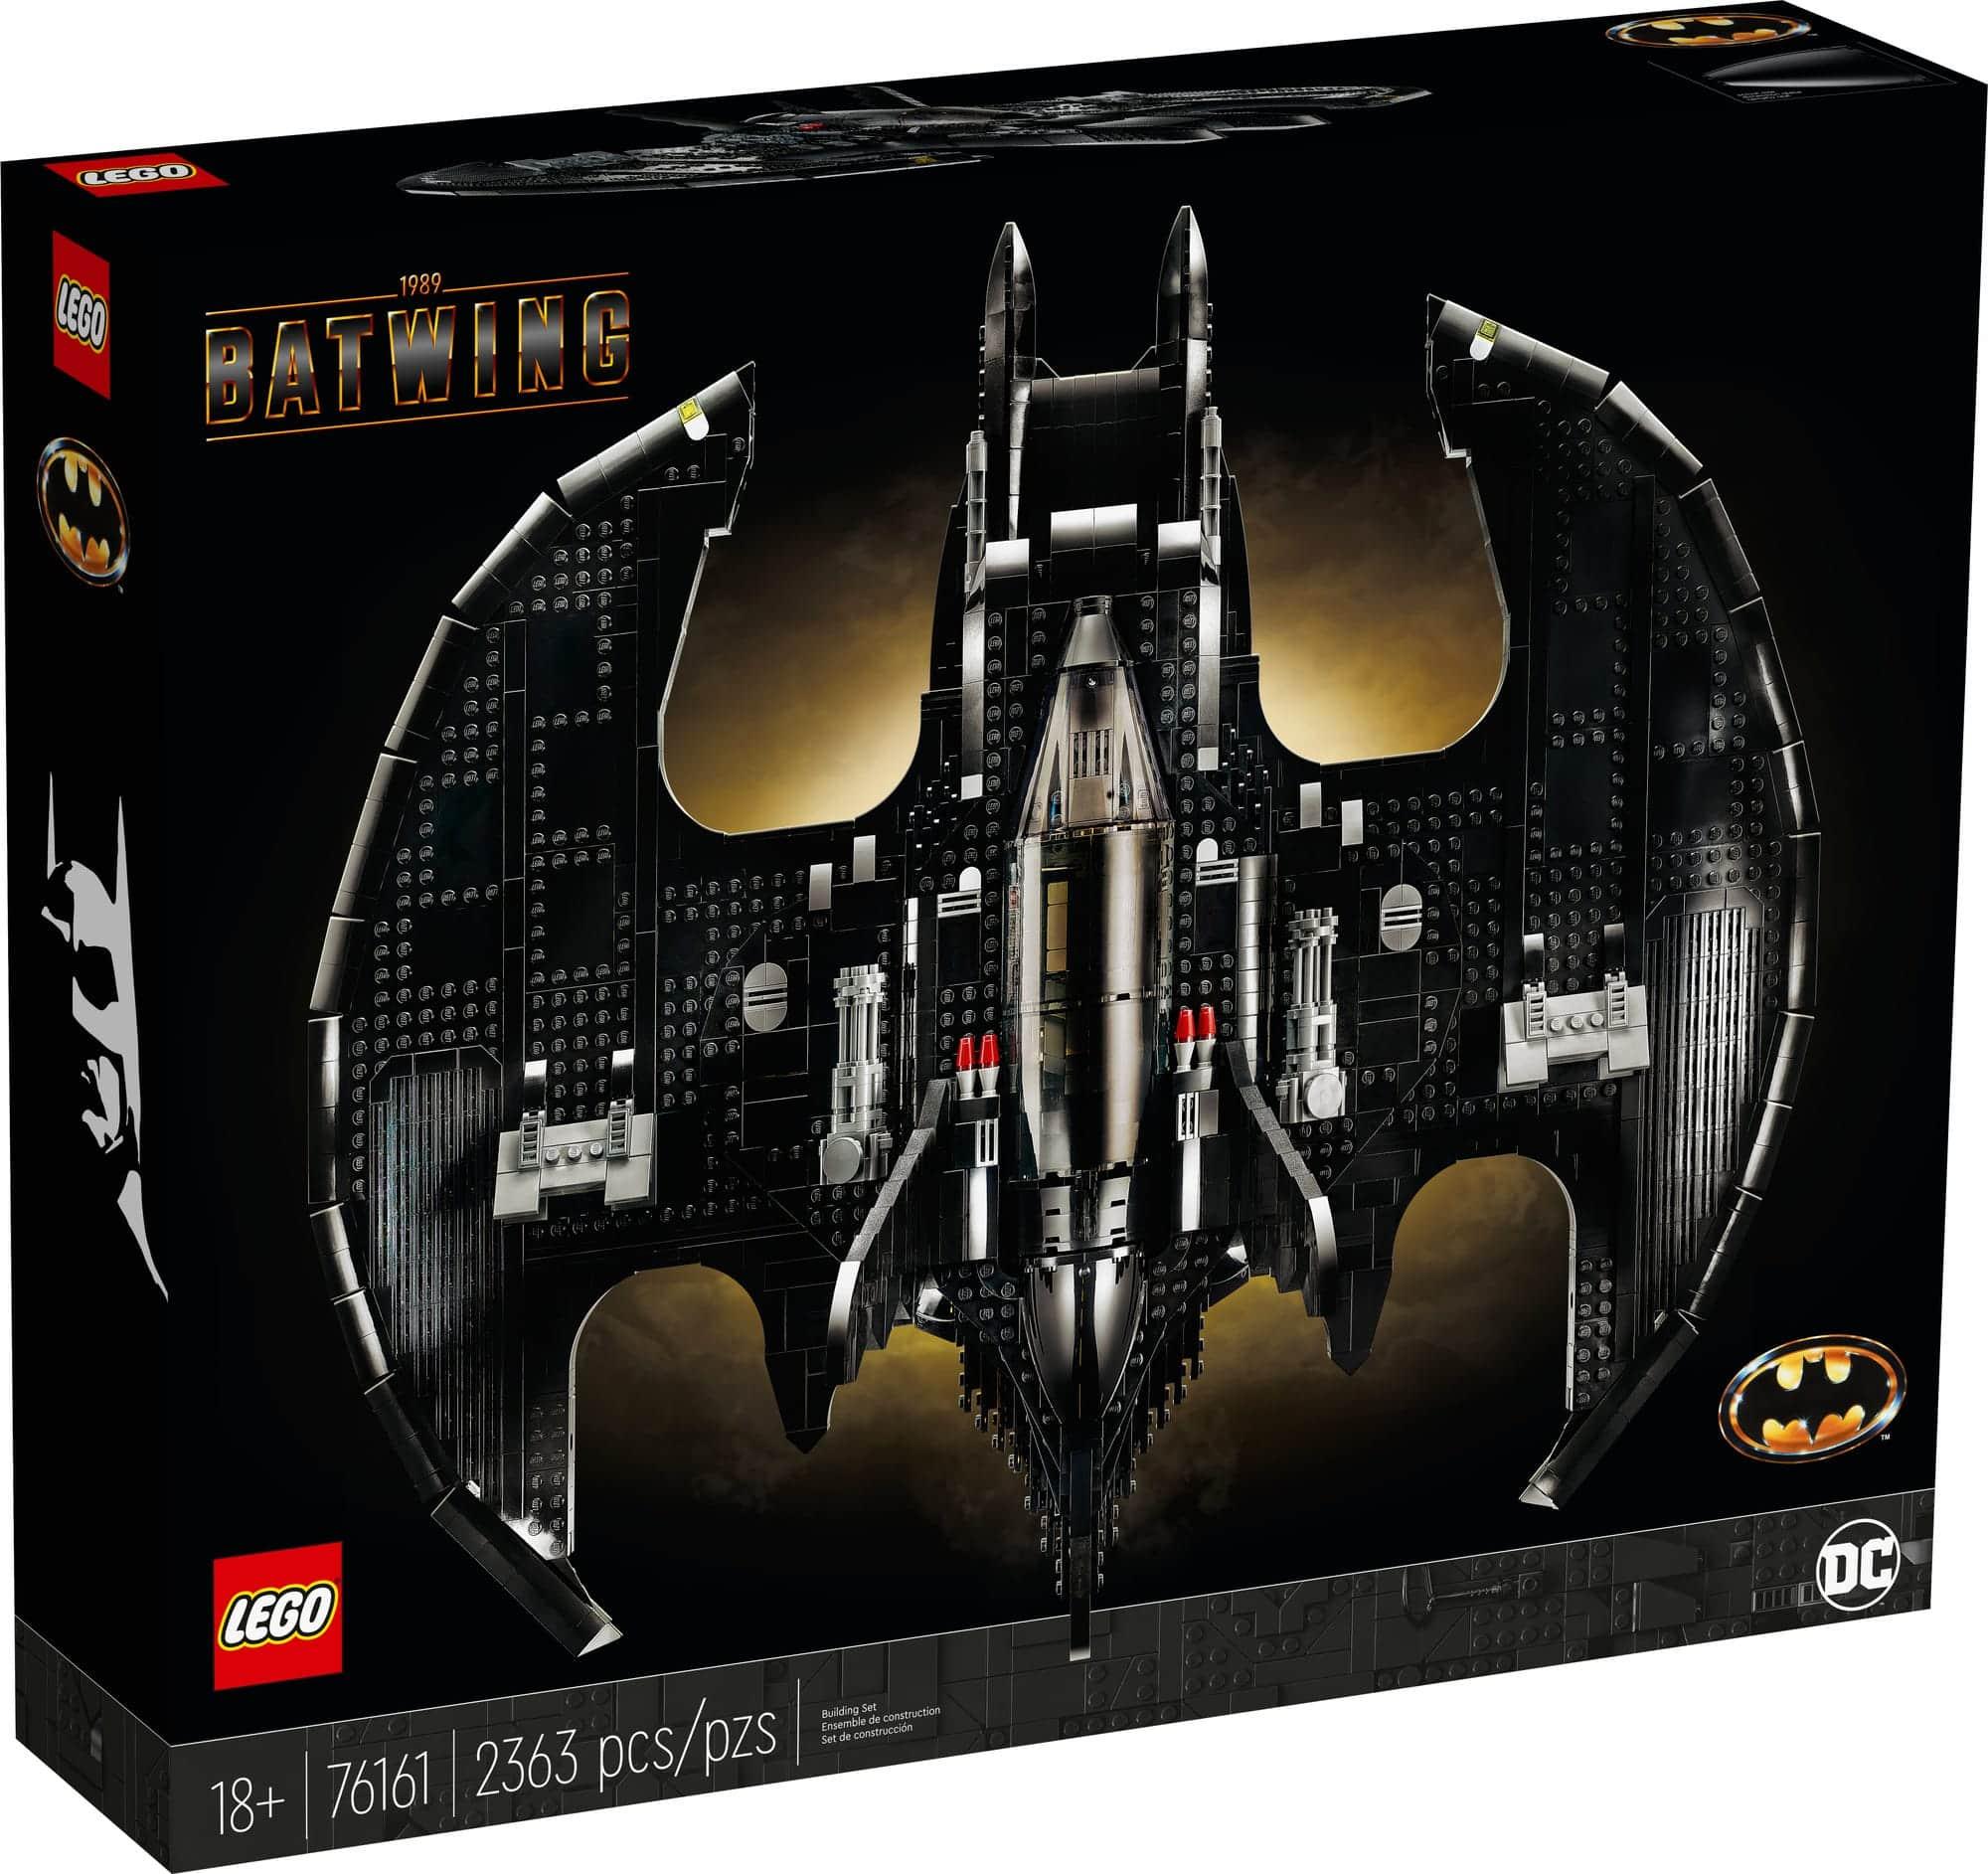 LEGO 76161 Batman 1989